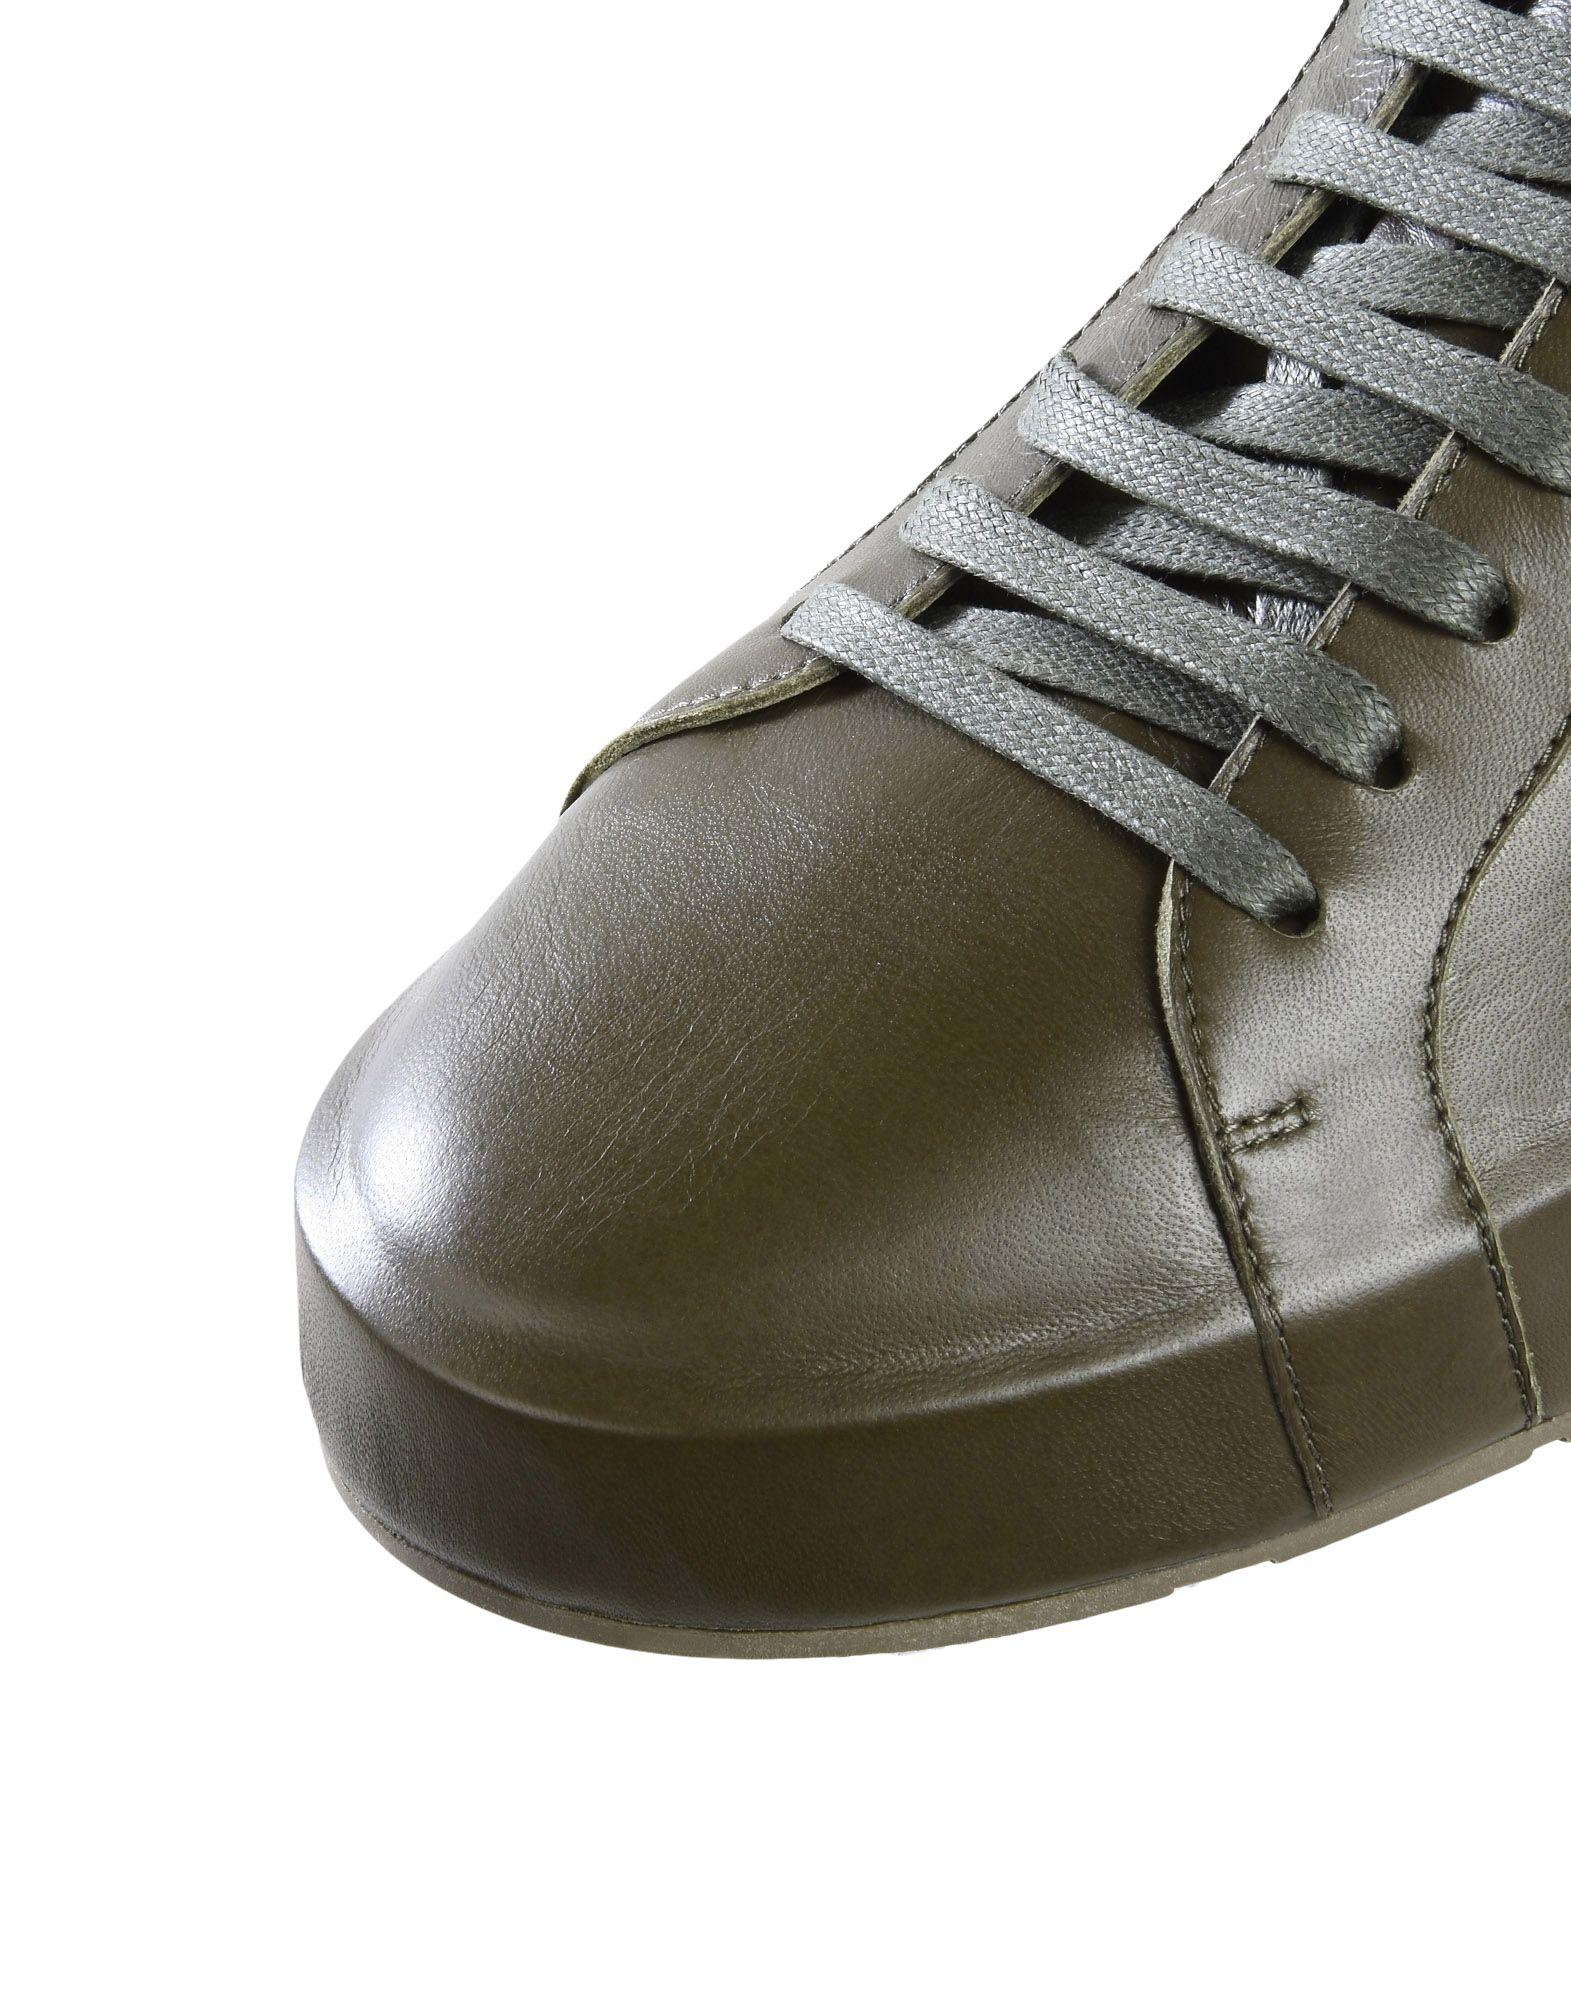 Jil Sander Sneakers 11367812KQ Herren  11367812KQ Sneakers Neue Schuhe 71a321